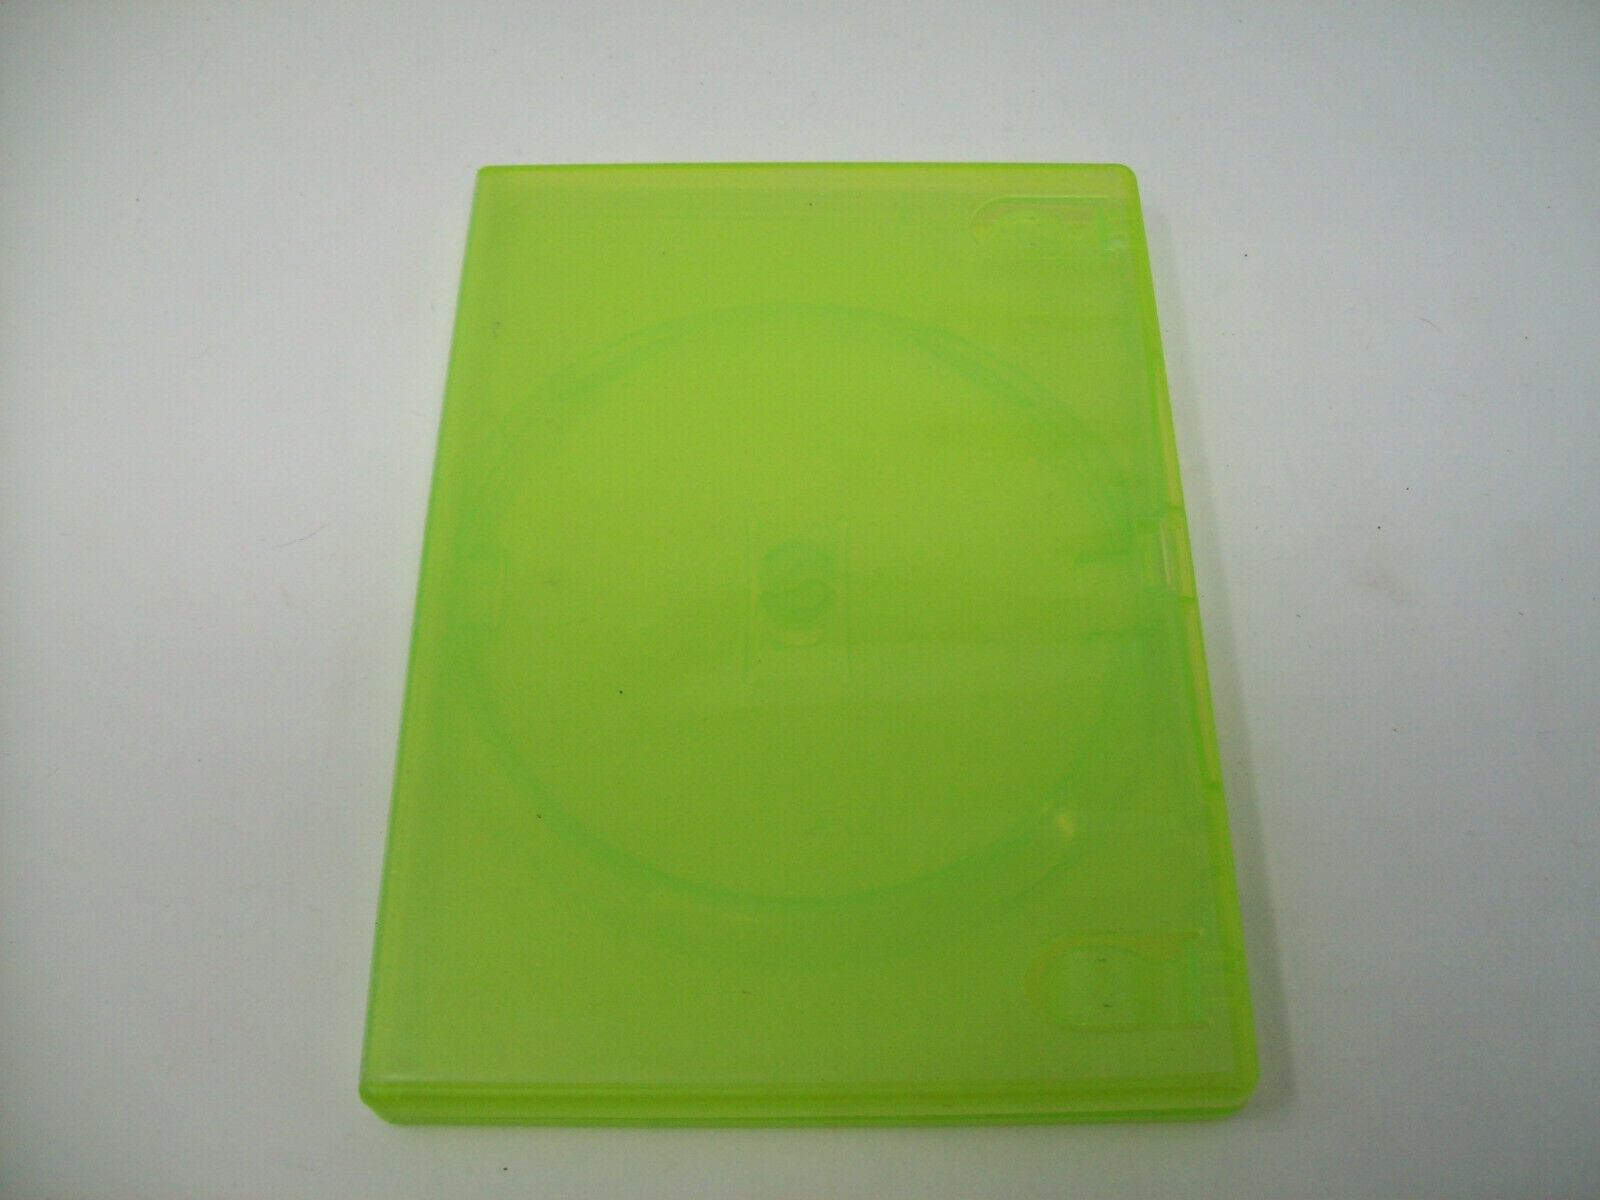 Original Retail Xbox 360 Empty Green Game Case - very good condition